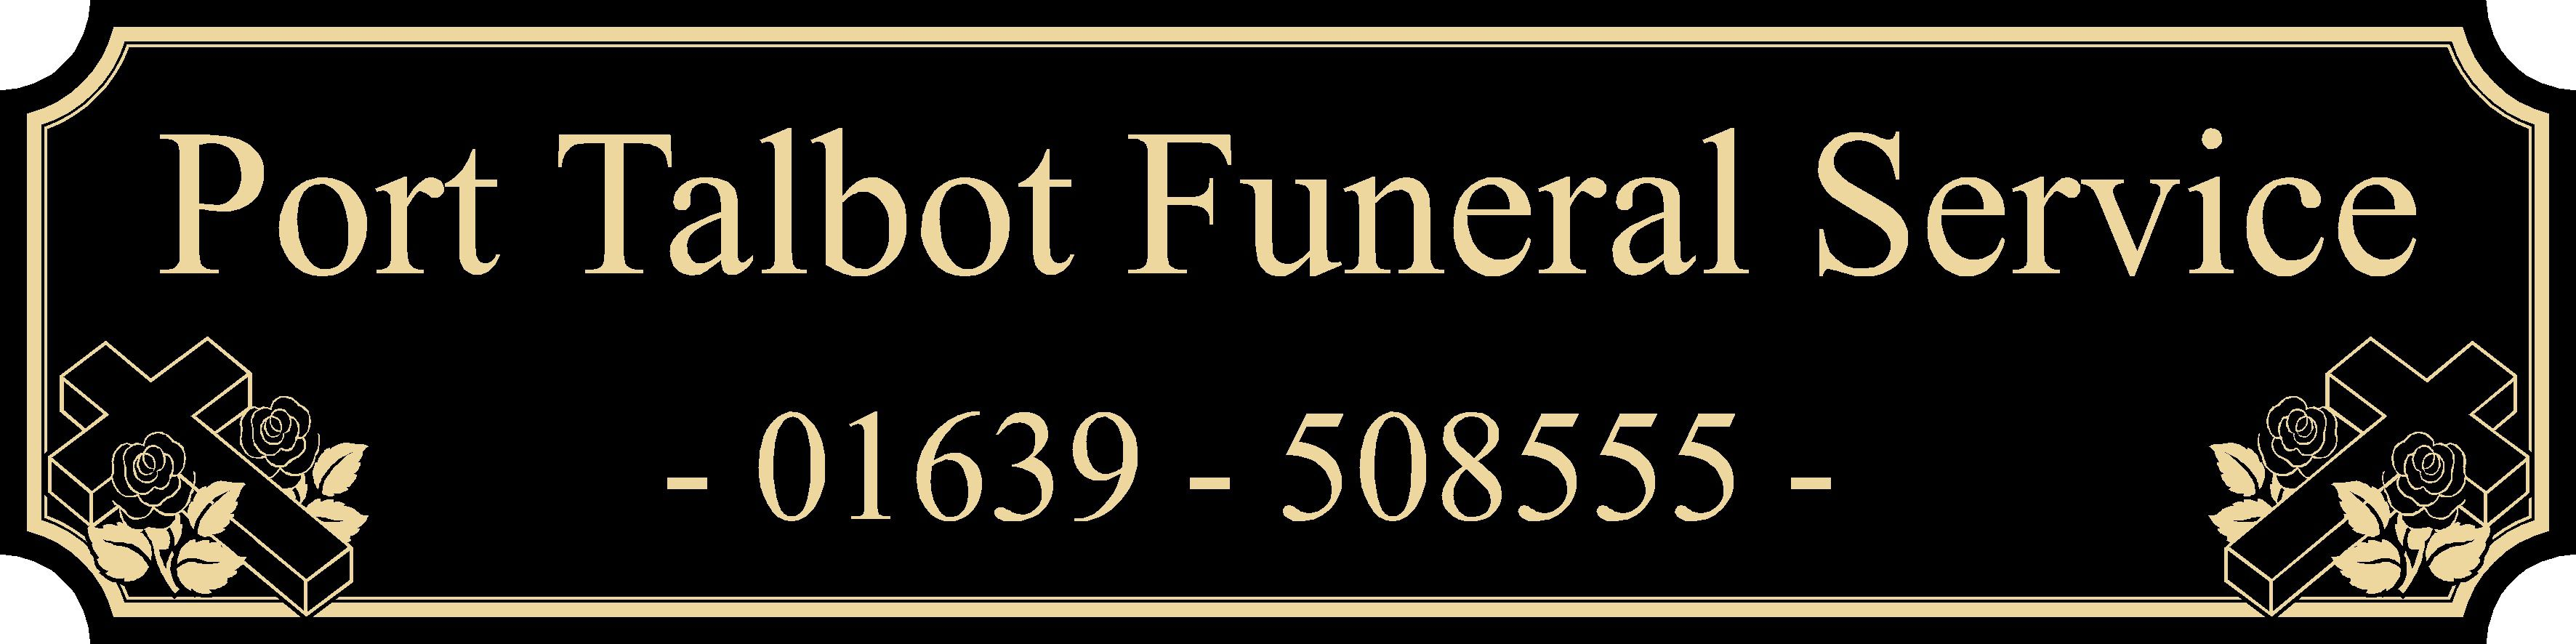 Port Talbot Funeral Service